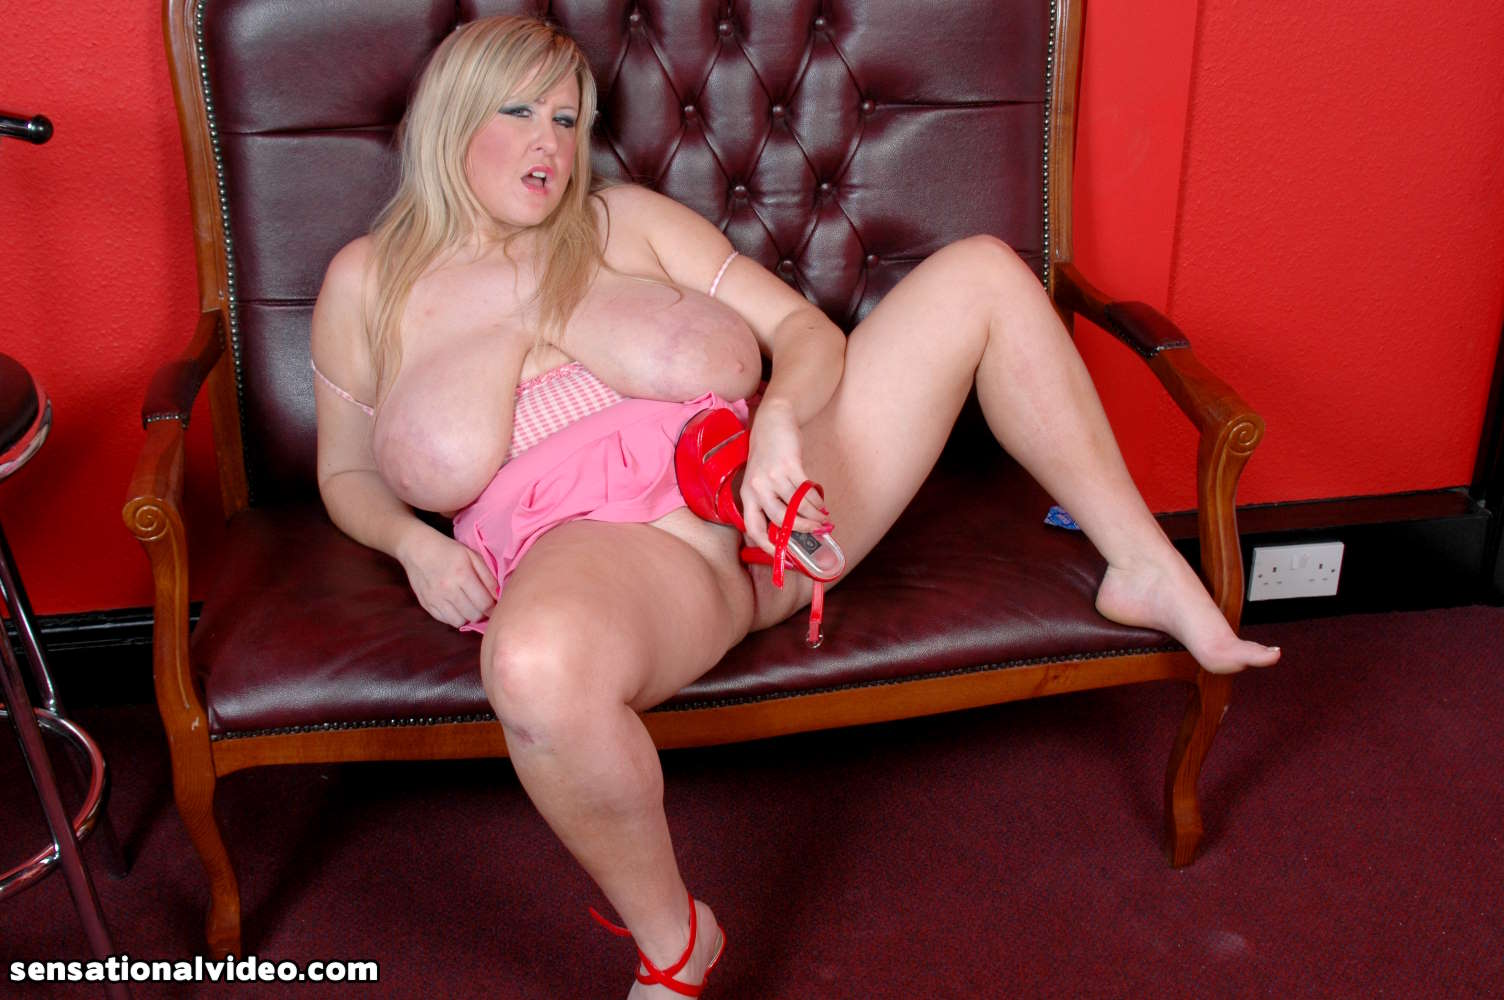 Leah Jayne Nottingham 40